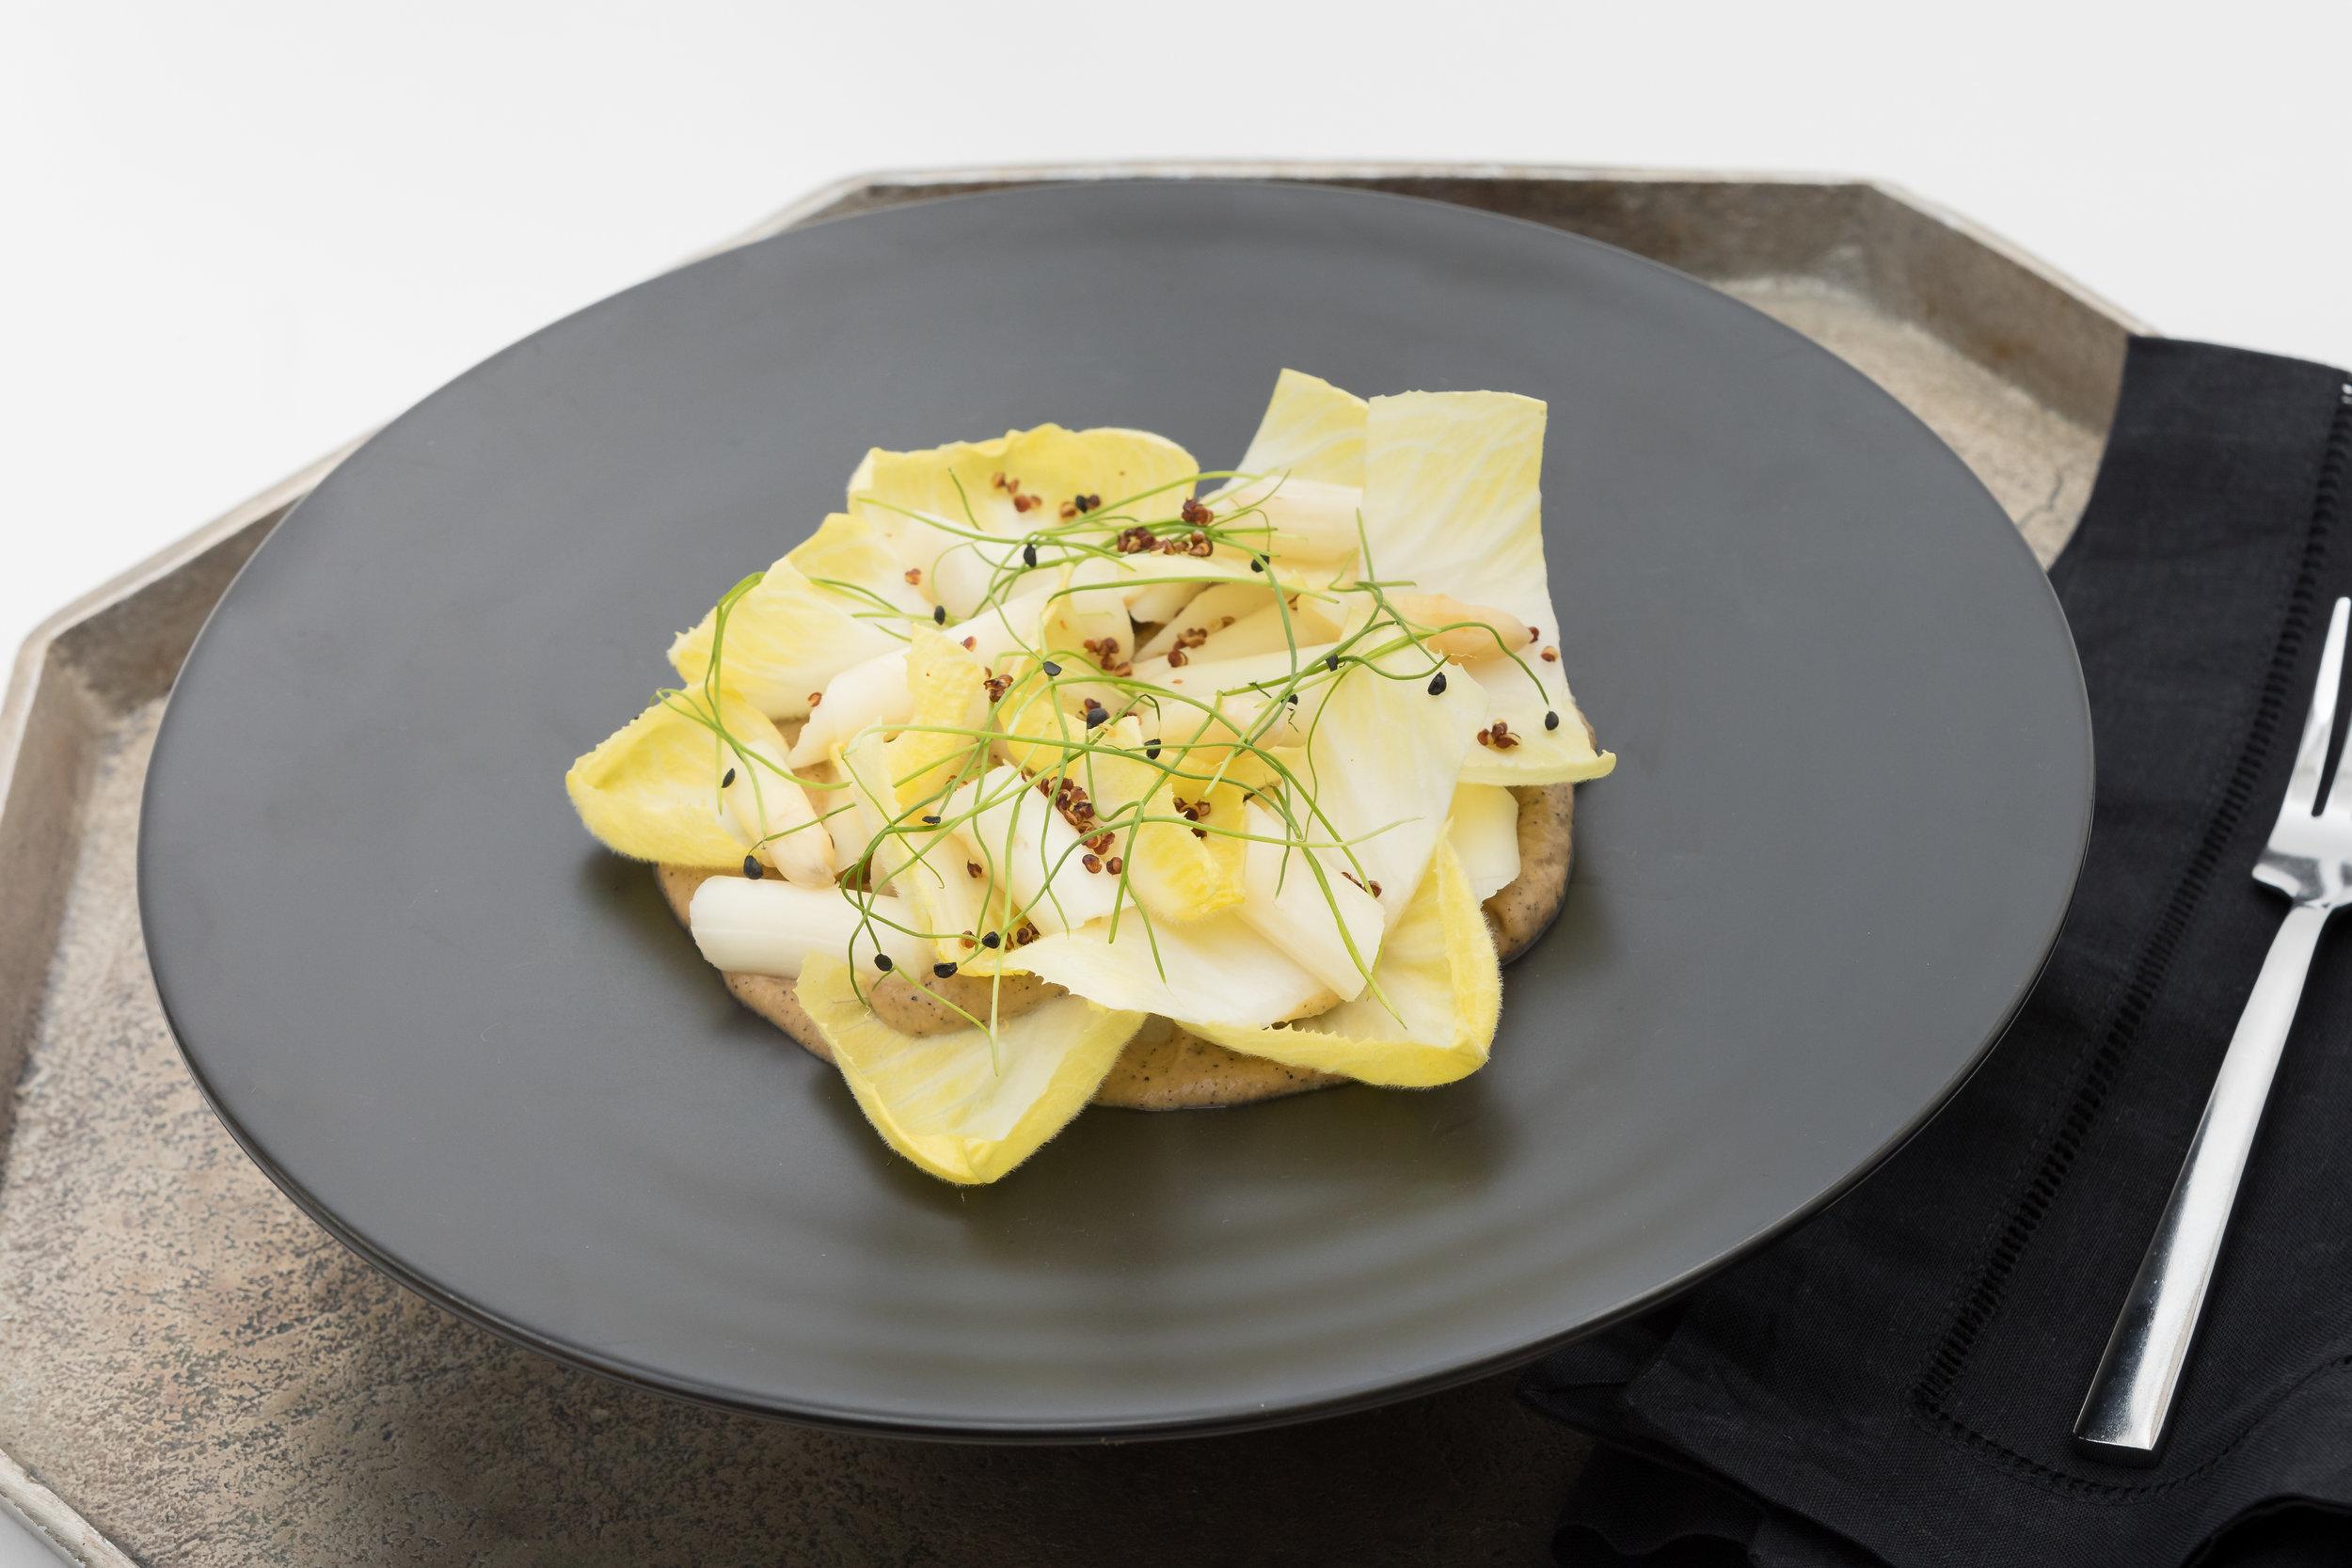 White Asparagus & Belgium Endive Salad w_Truffled Chanterelle Cream, Crispy Grains_Amanda Gentile1 (1).jpg